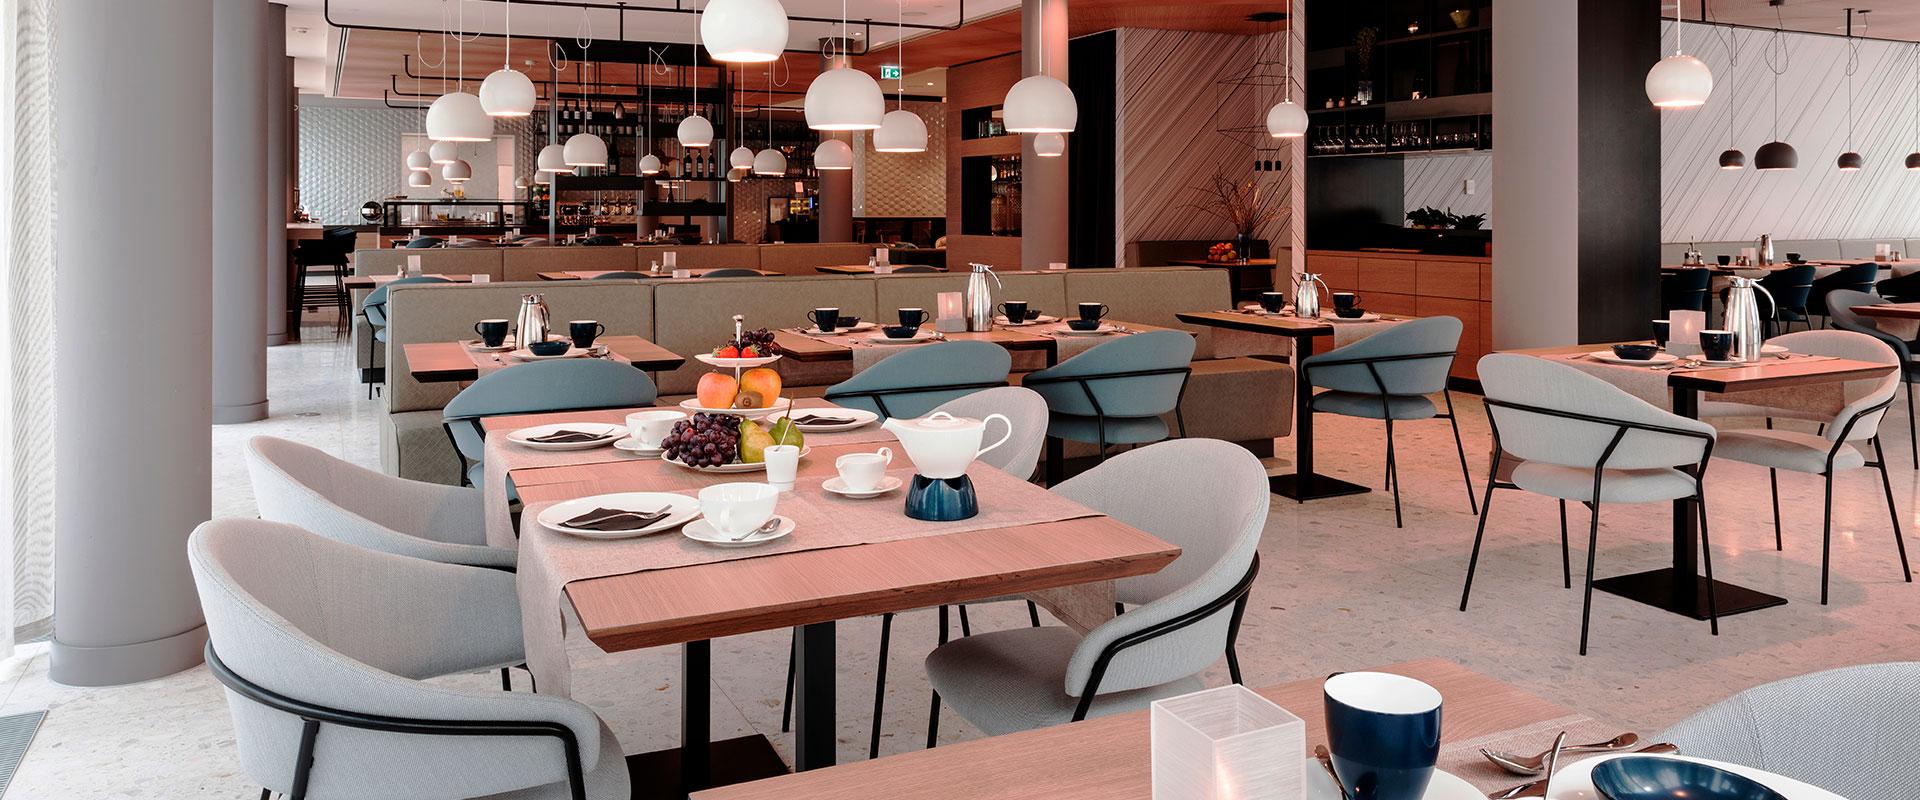 AGGLOTECH-progetto-Hotel-Salinengarten-slider-4